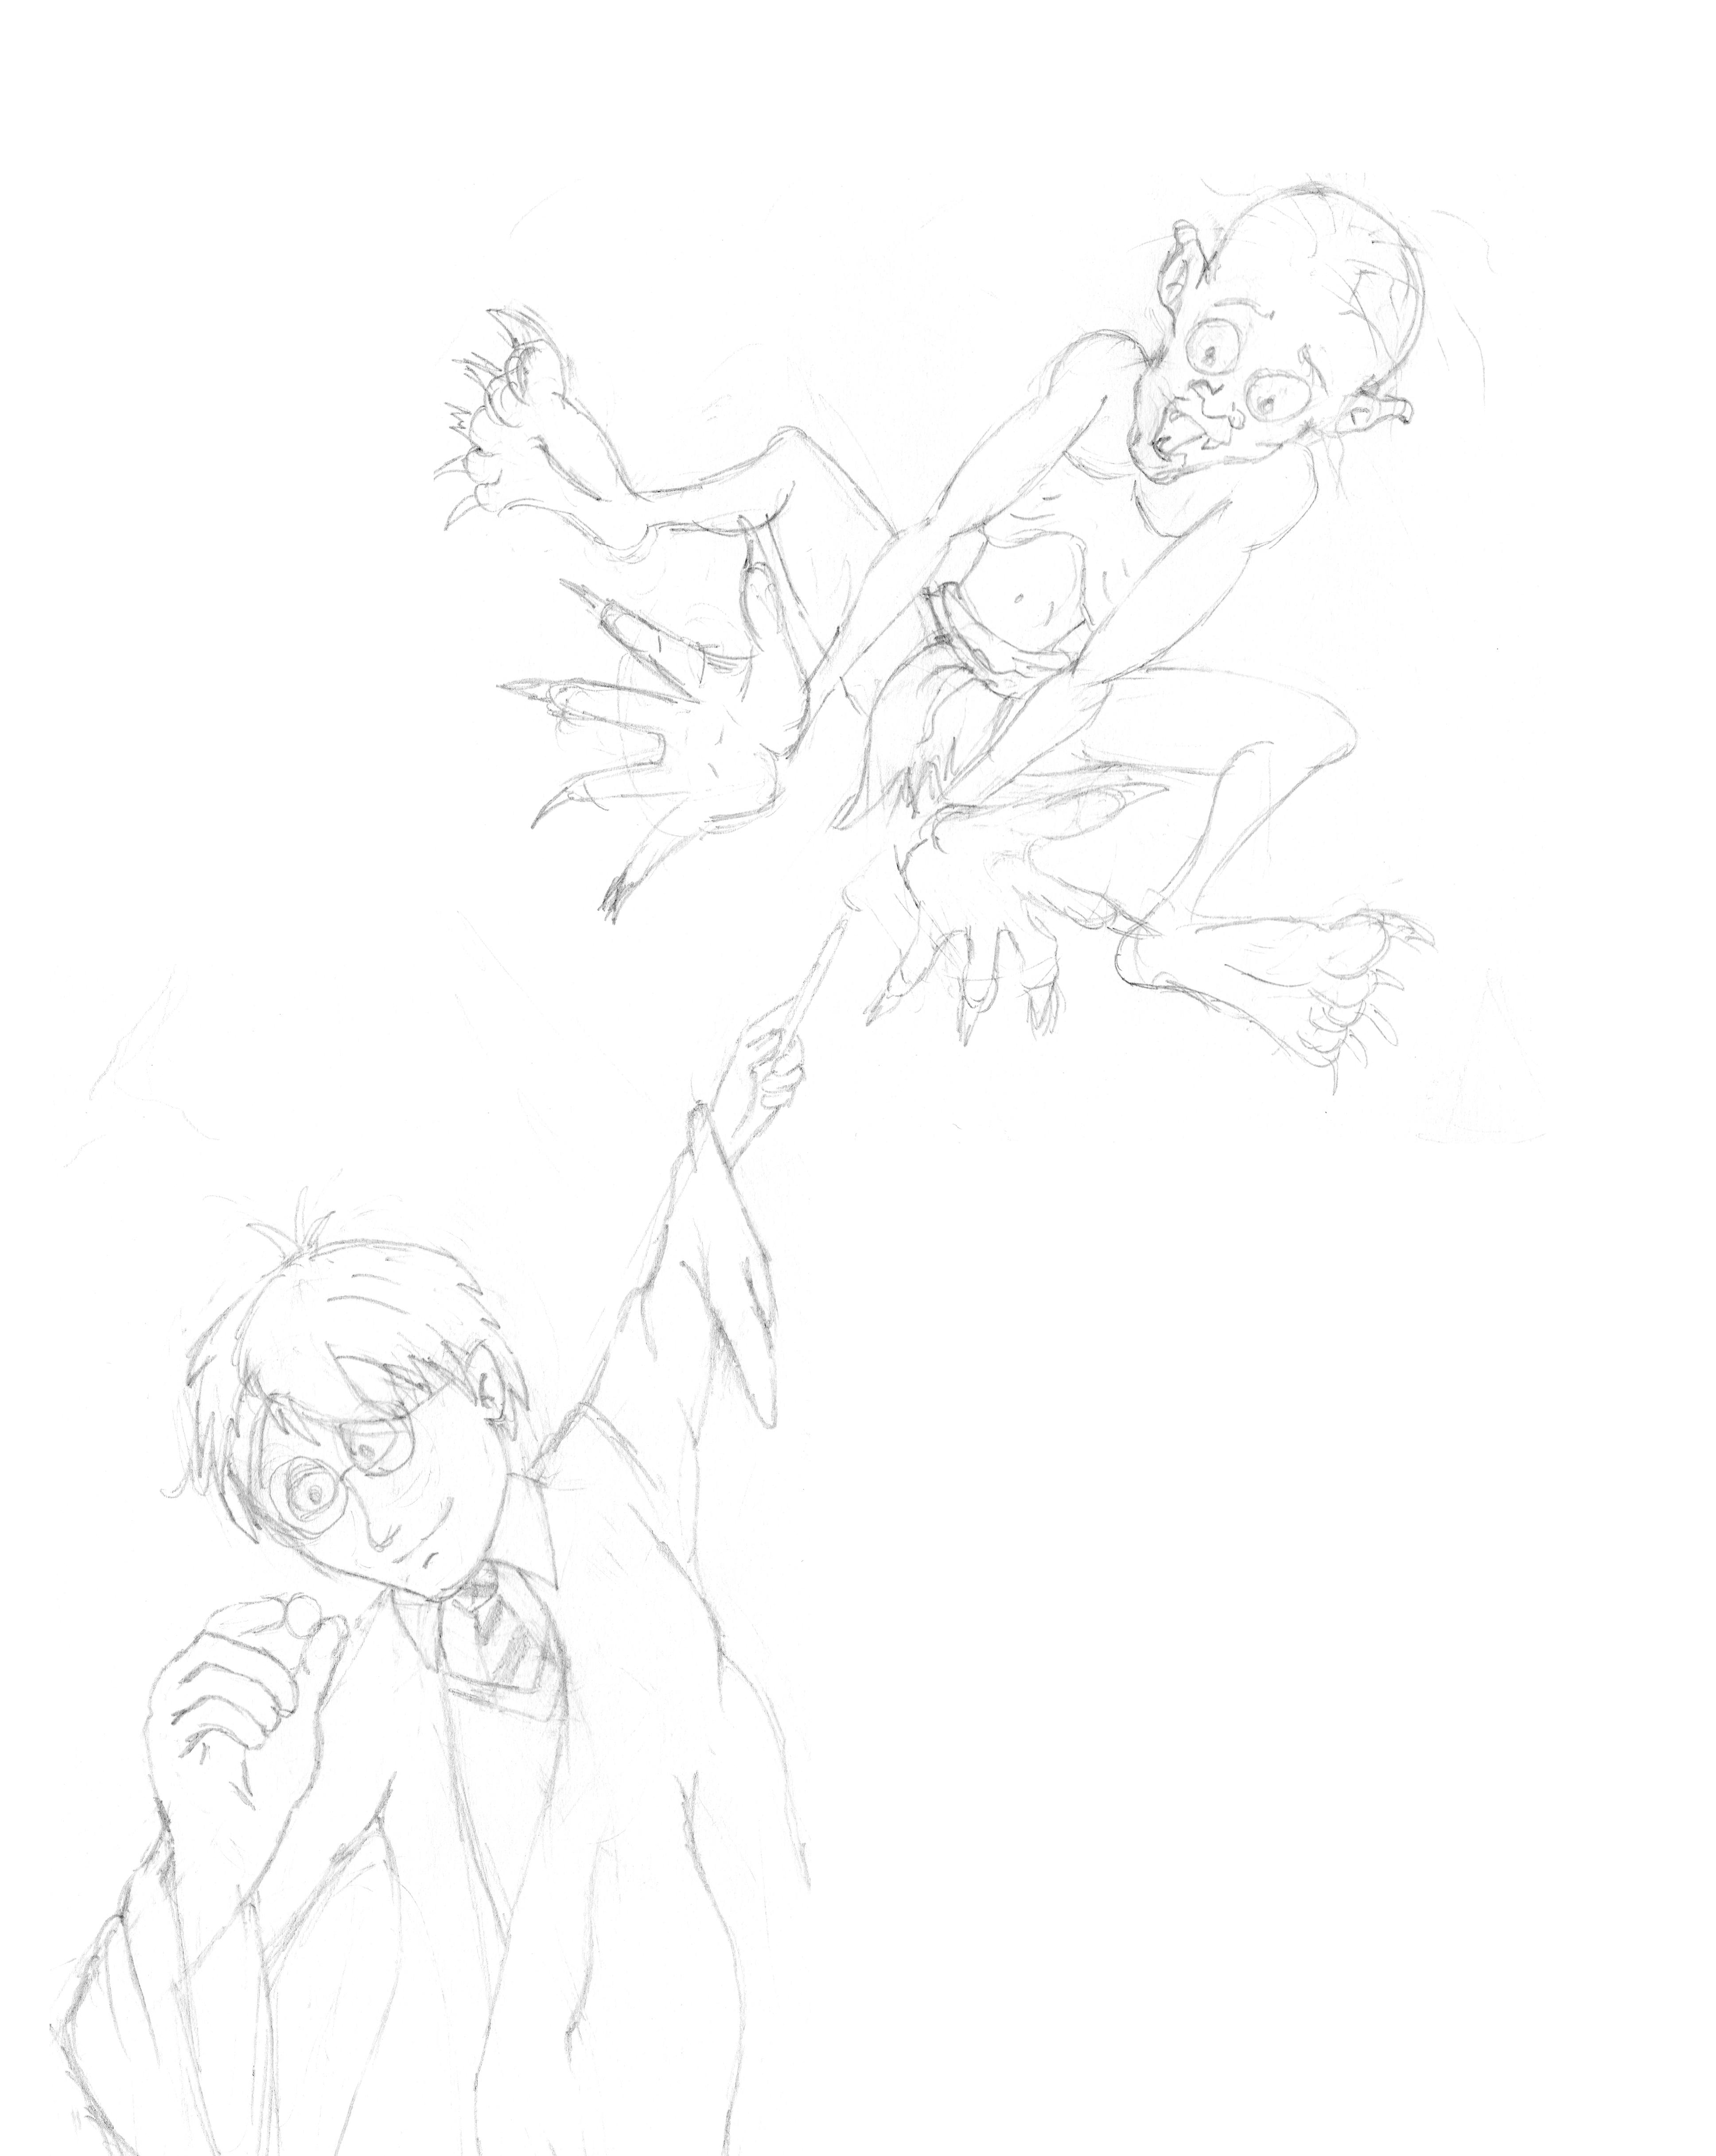 Give me the precious sketch